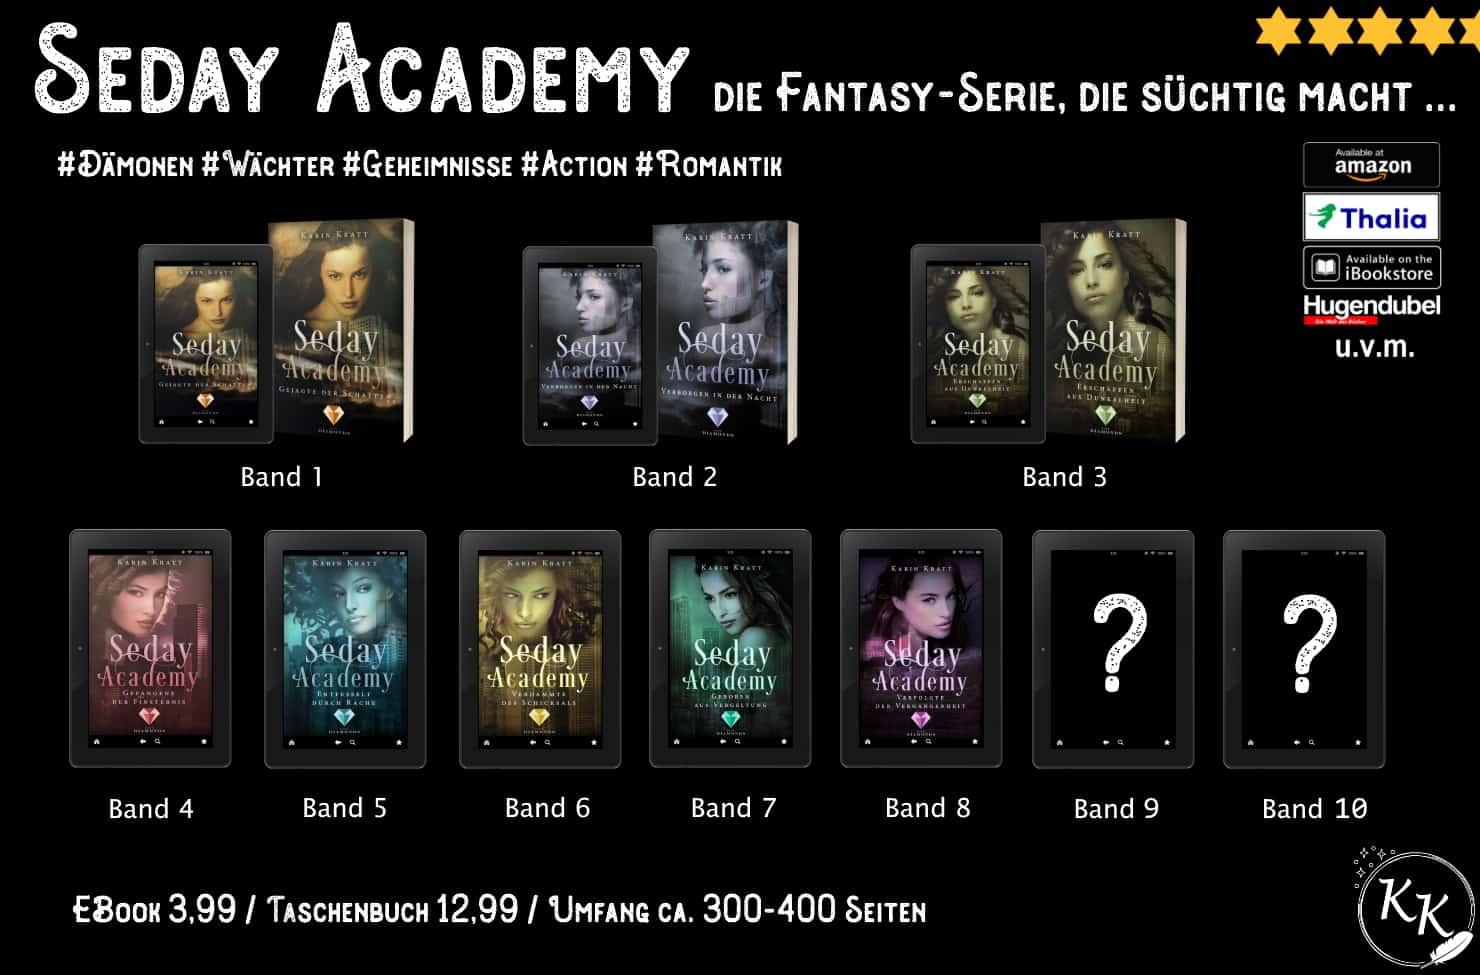 Seday Academy Band 9 & 10 News